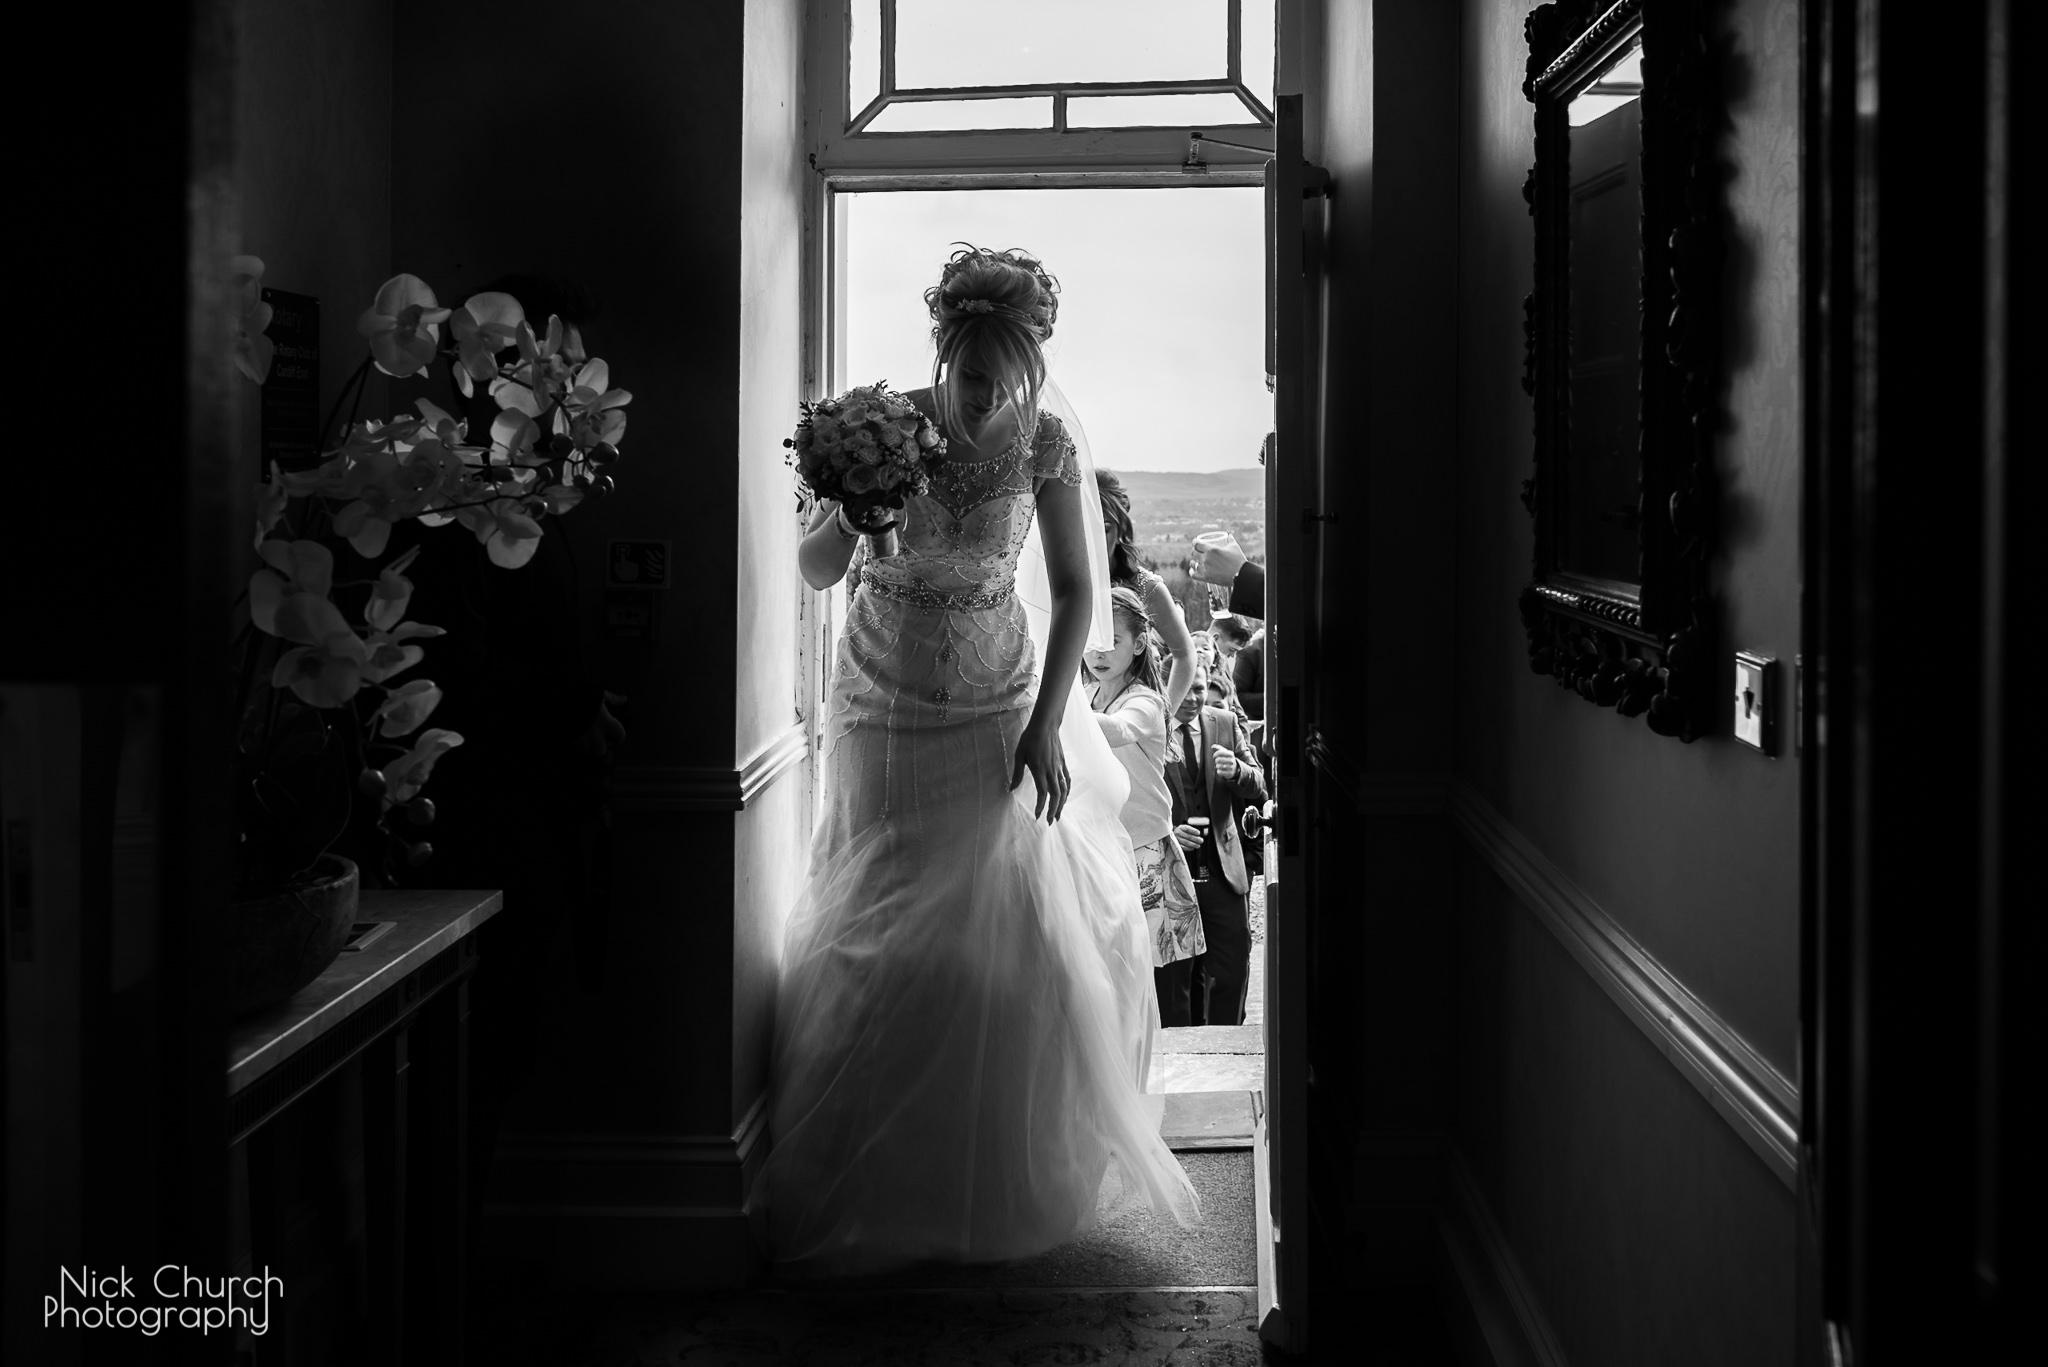 NC-20180317-stacy-and-mike-wedding-1061.jpg